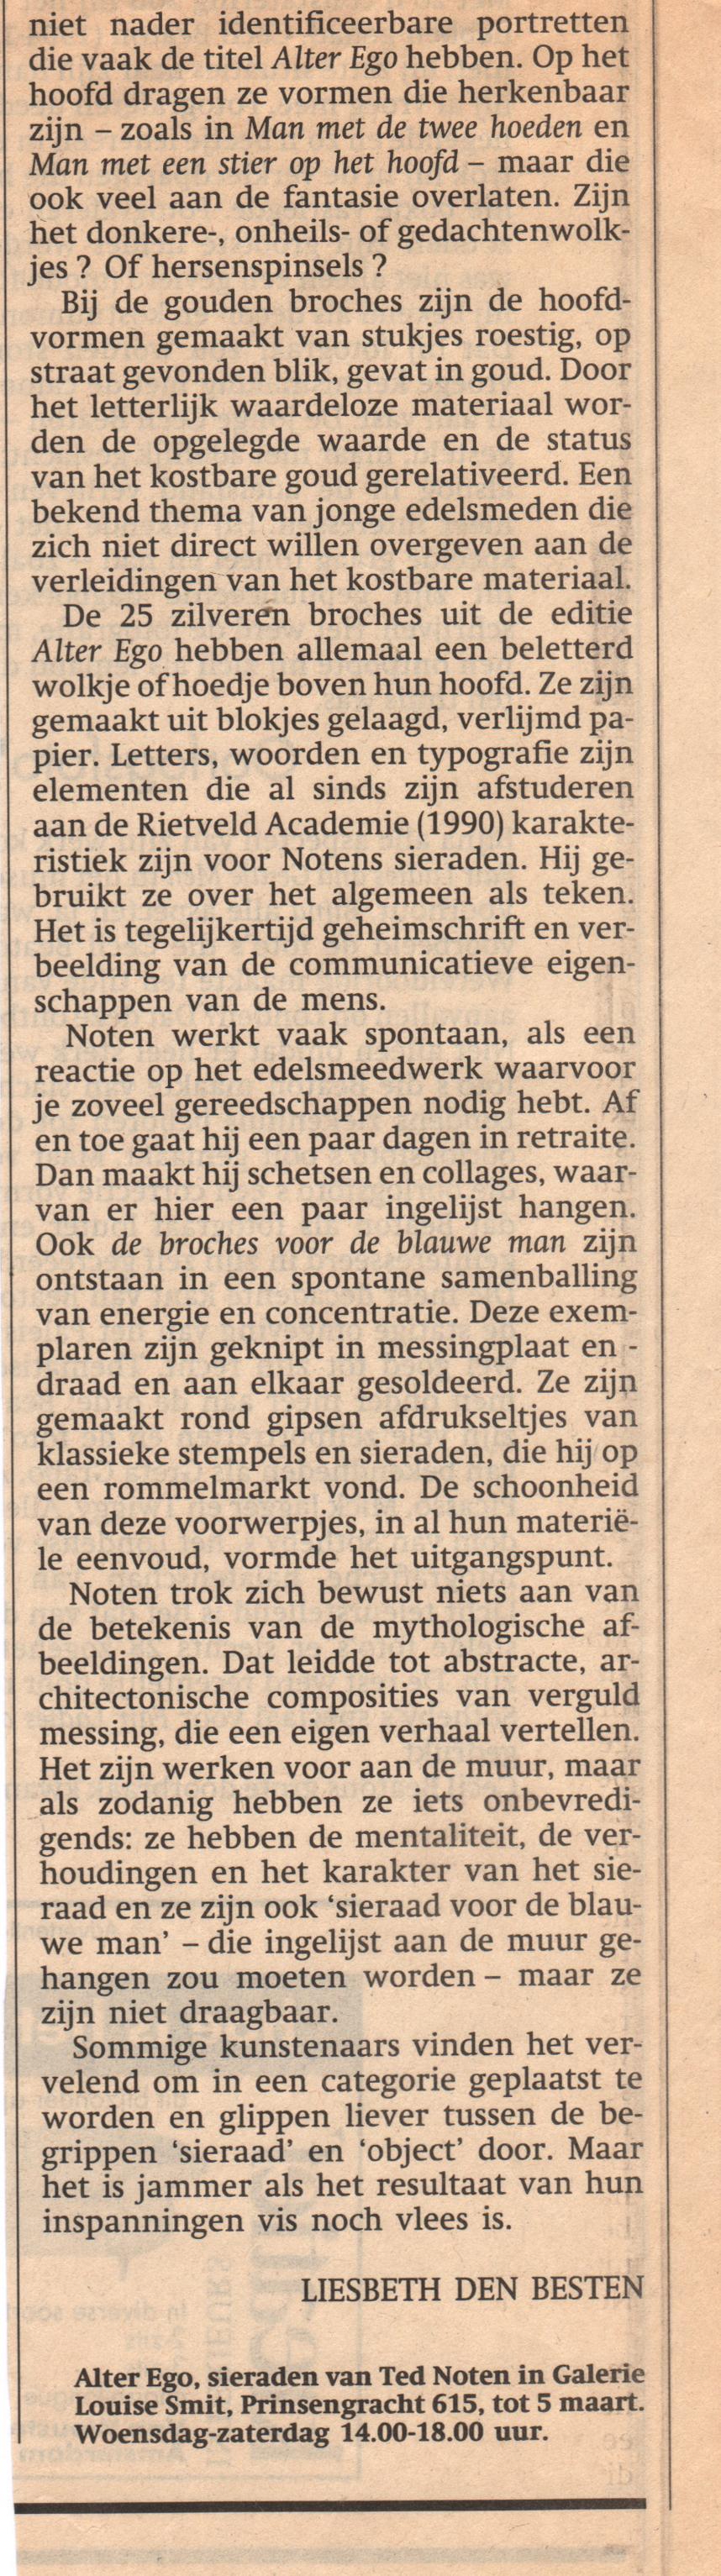 Recensie Liesbeth den Besten in Het Parool, 15 februari 1994, Alter Ego, Ted Noten, Galerie Louise Smit, drukwerk, krant